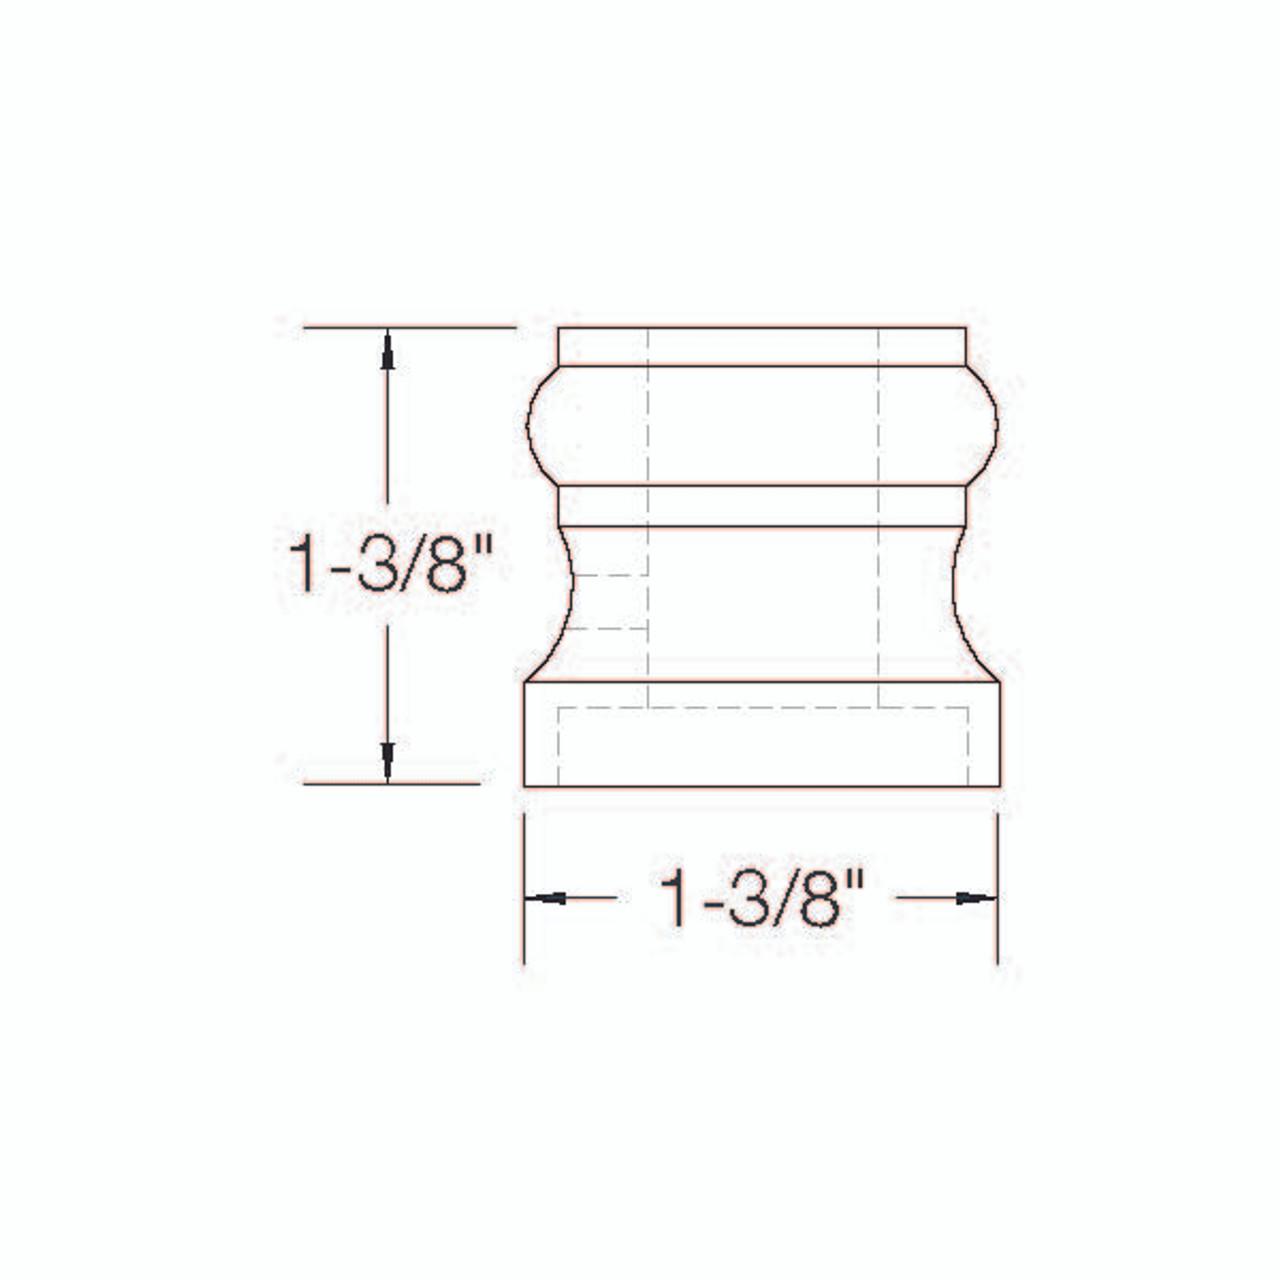 2GR900 Flat Shoe Dimensional Information